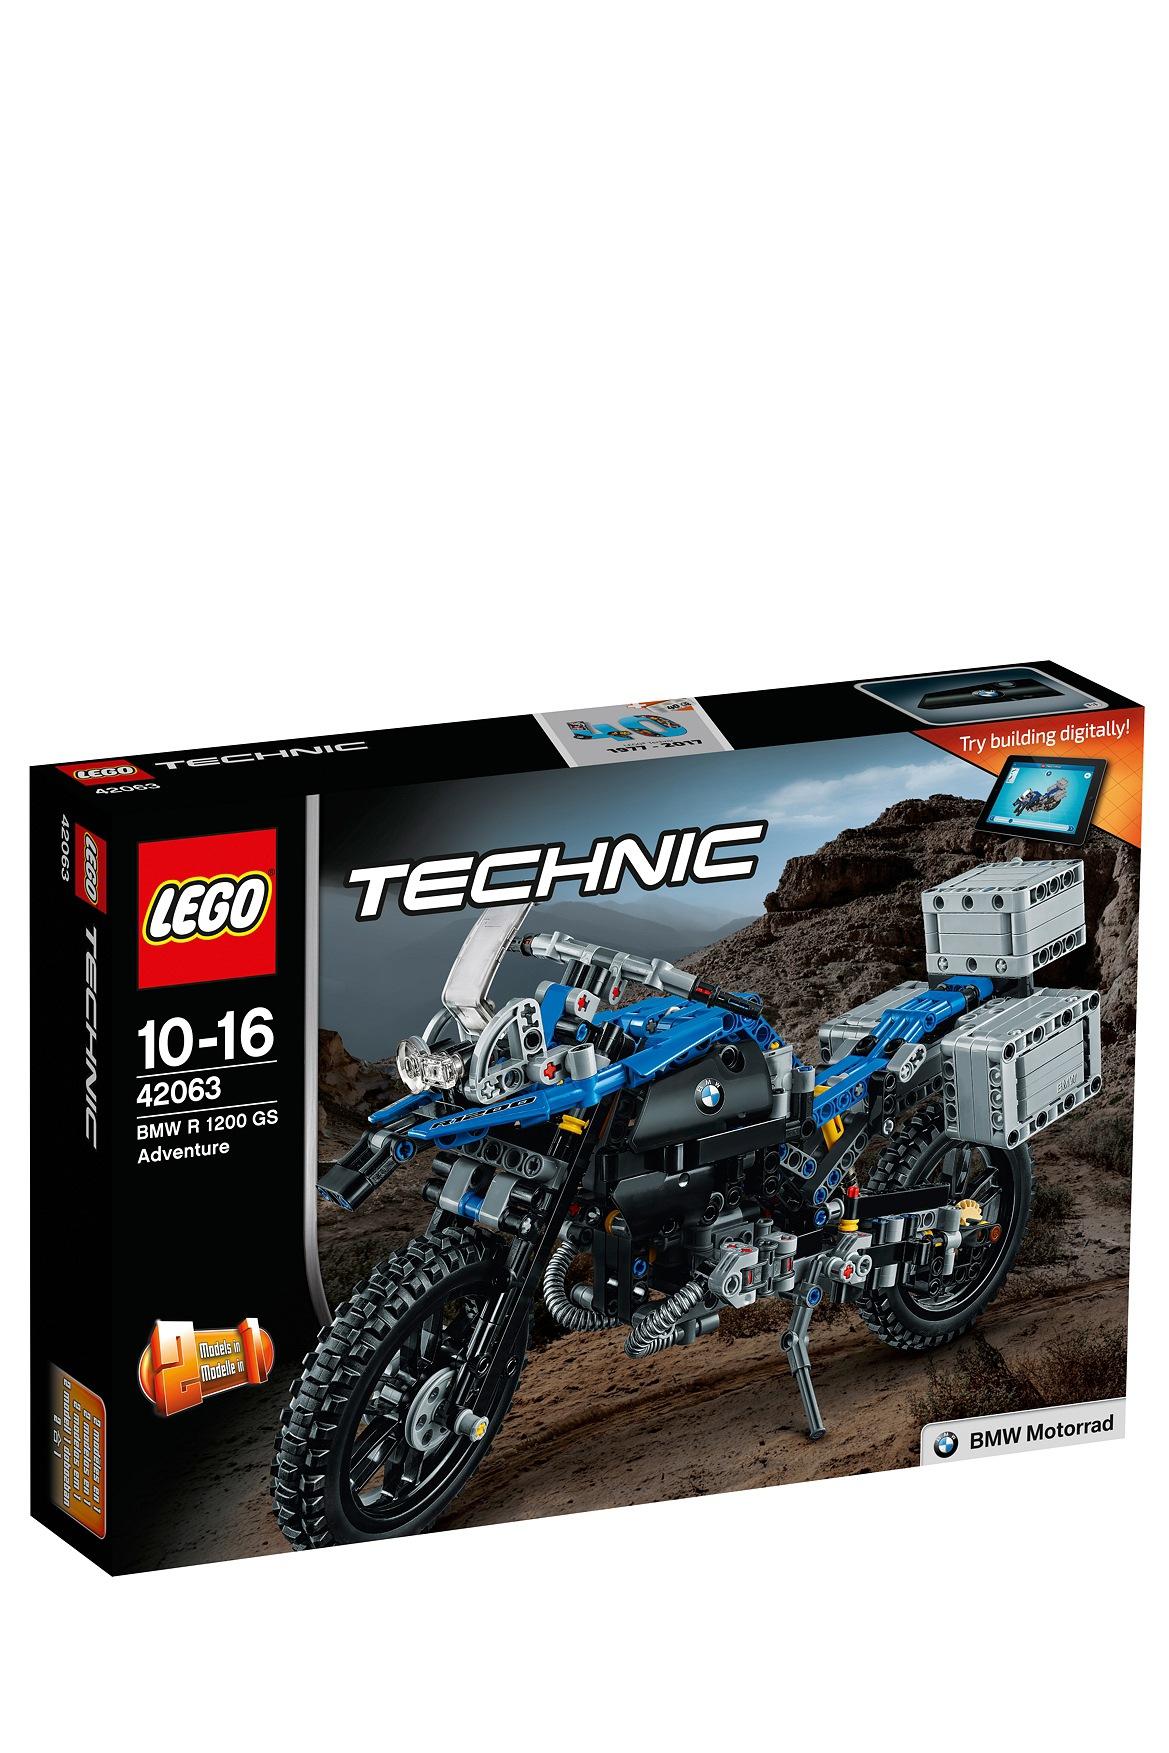 lego | technic bmw r 1200 gs adventure 42063 | myer online